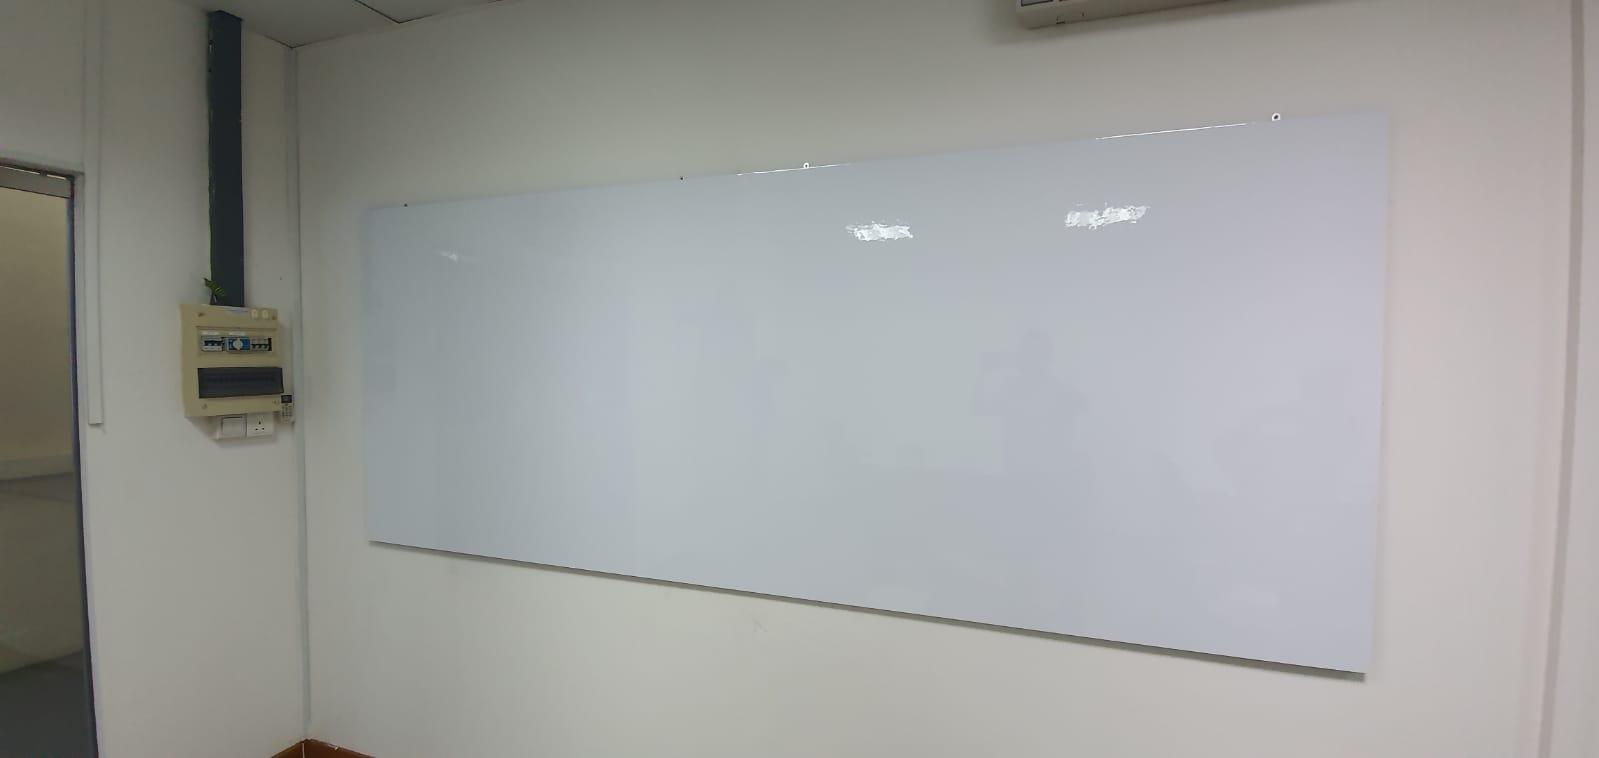 Full Length Wall Whiteboard